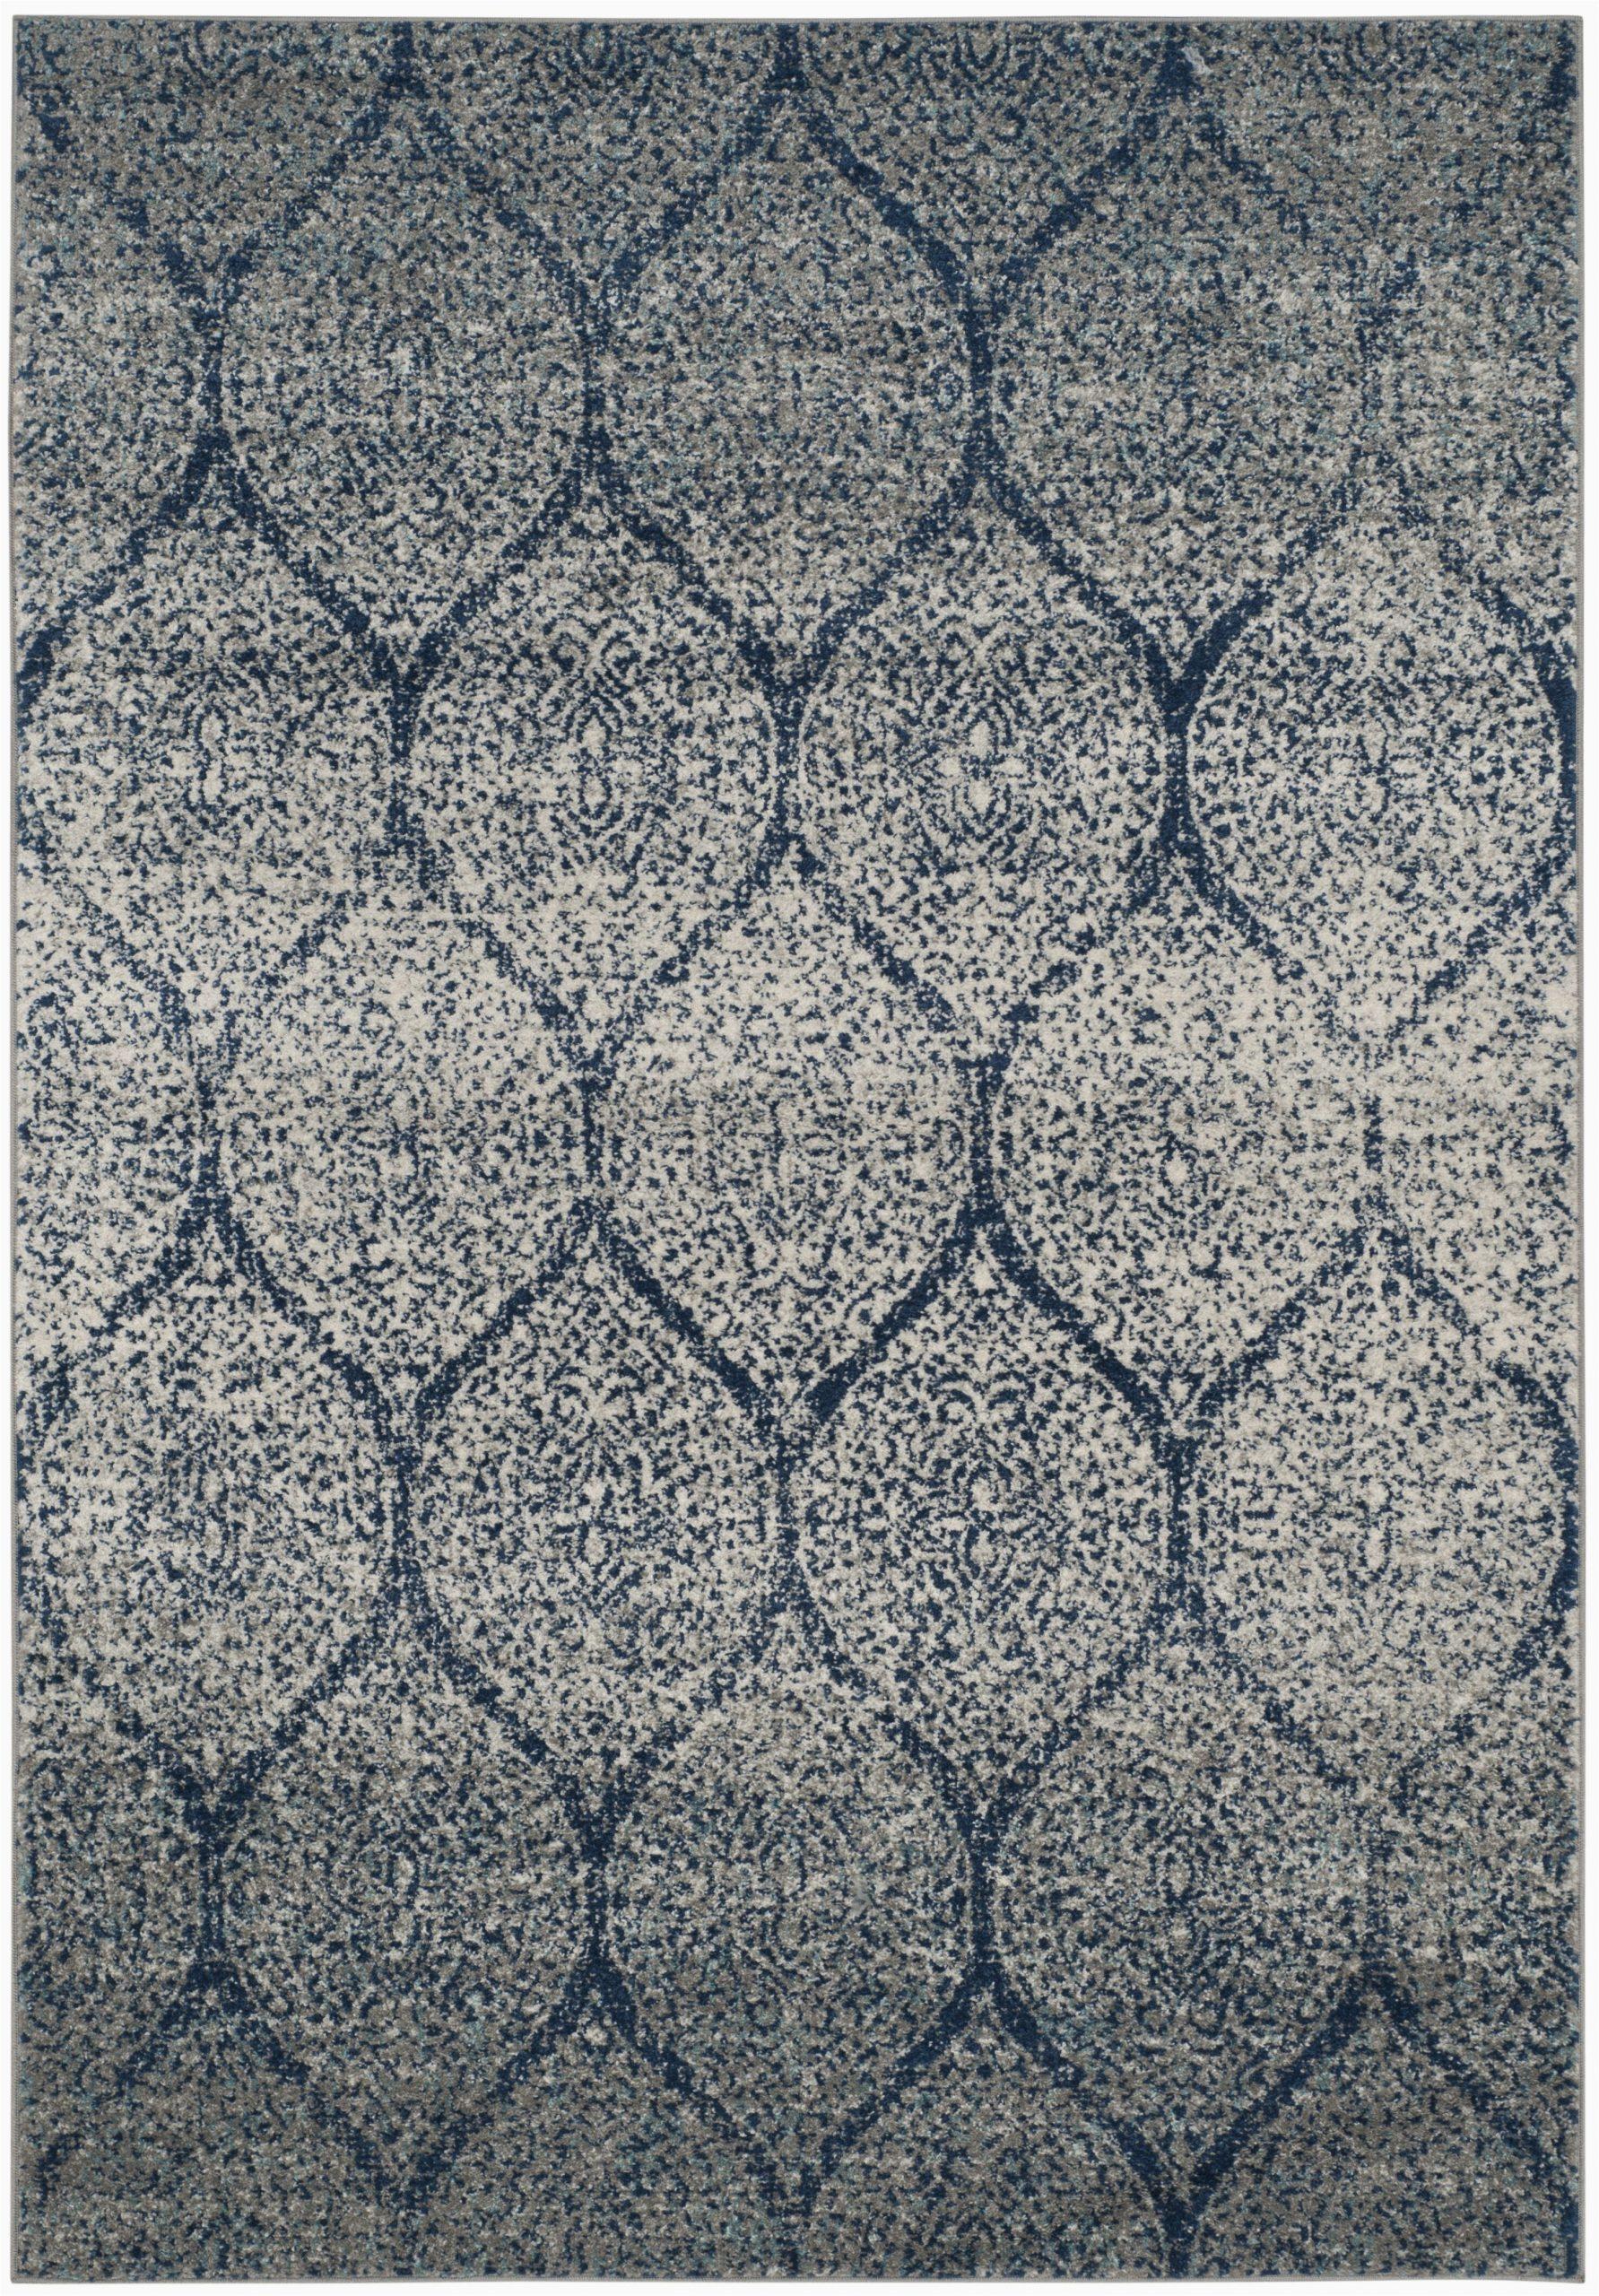 katie damask navy bluesilver rug